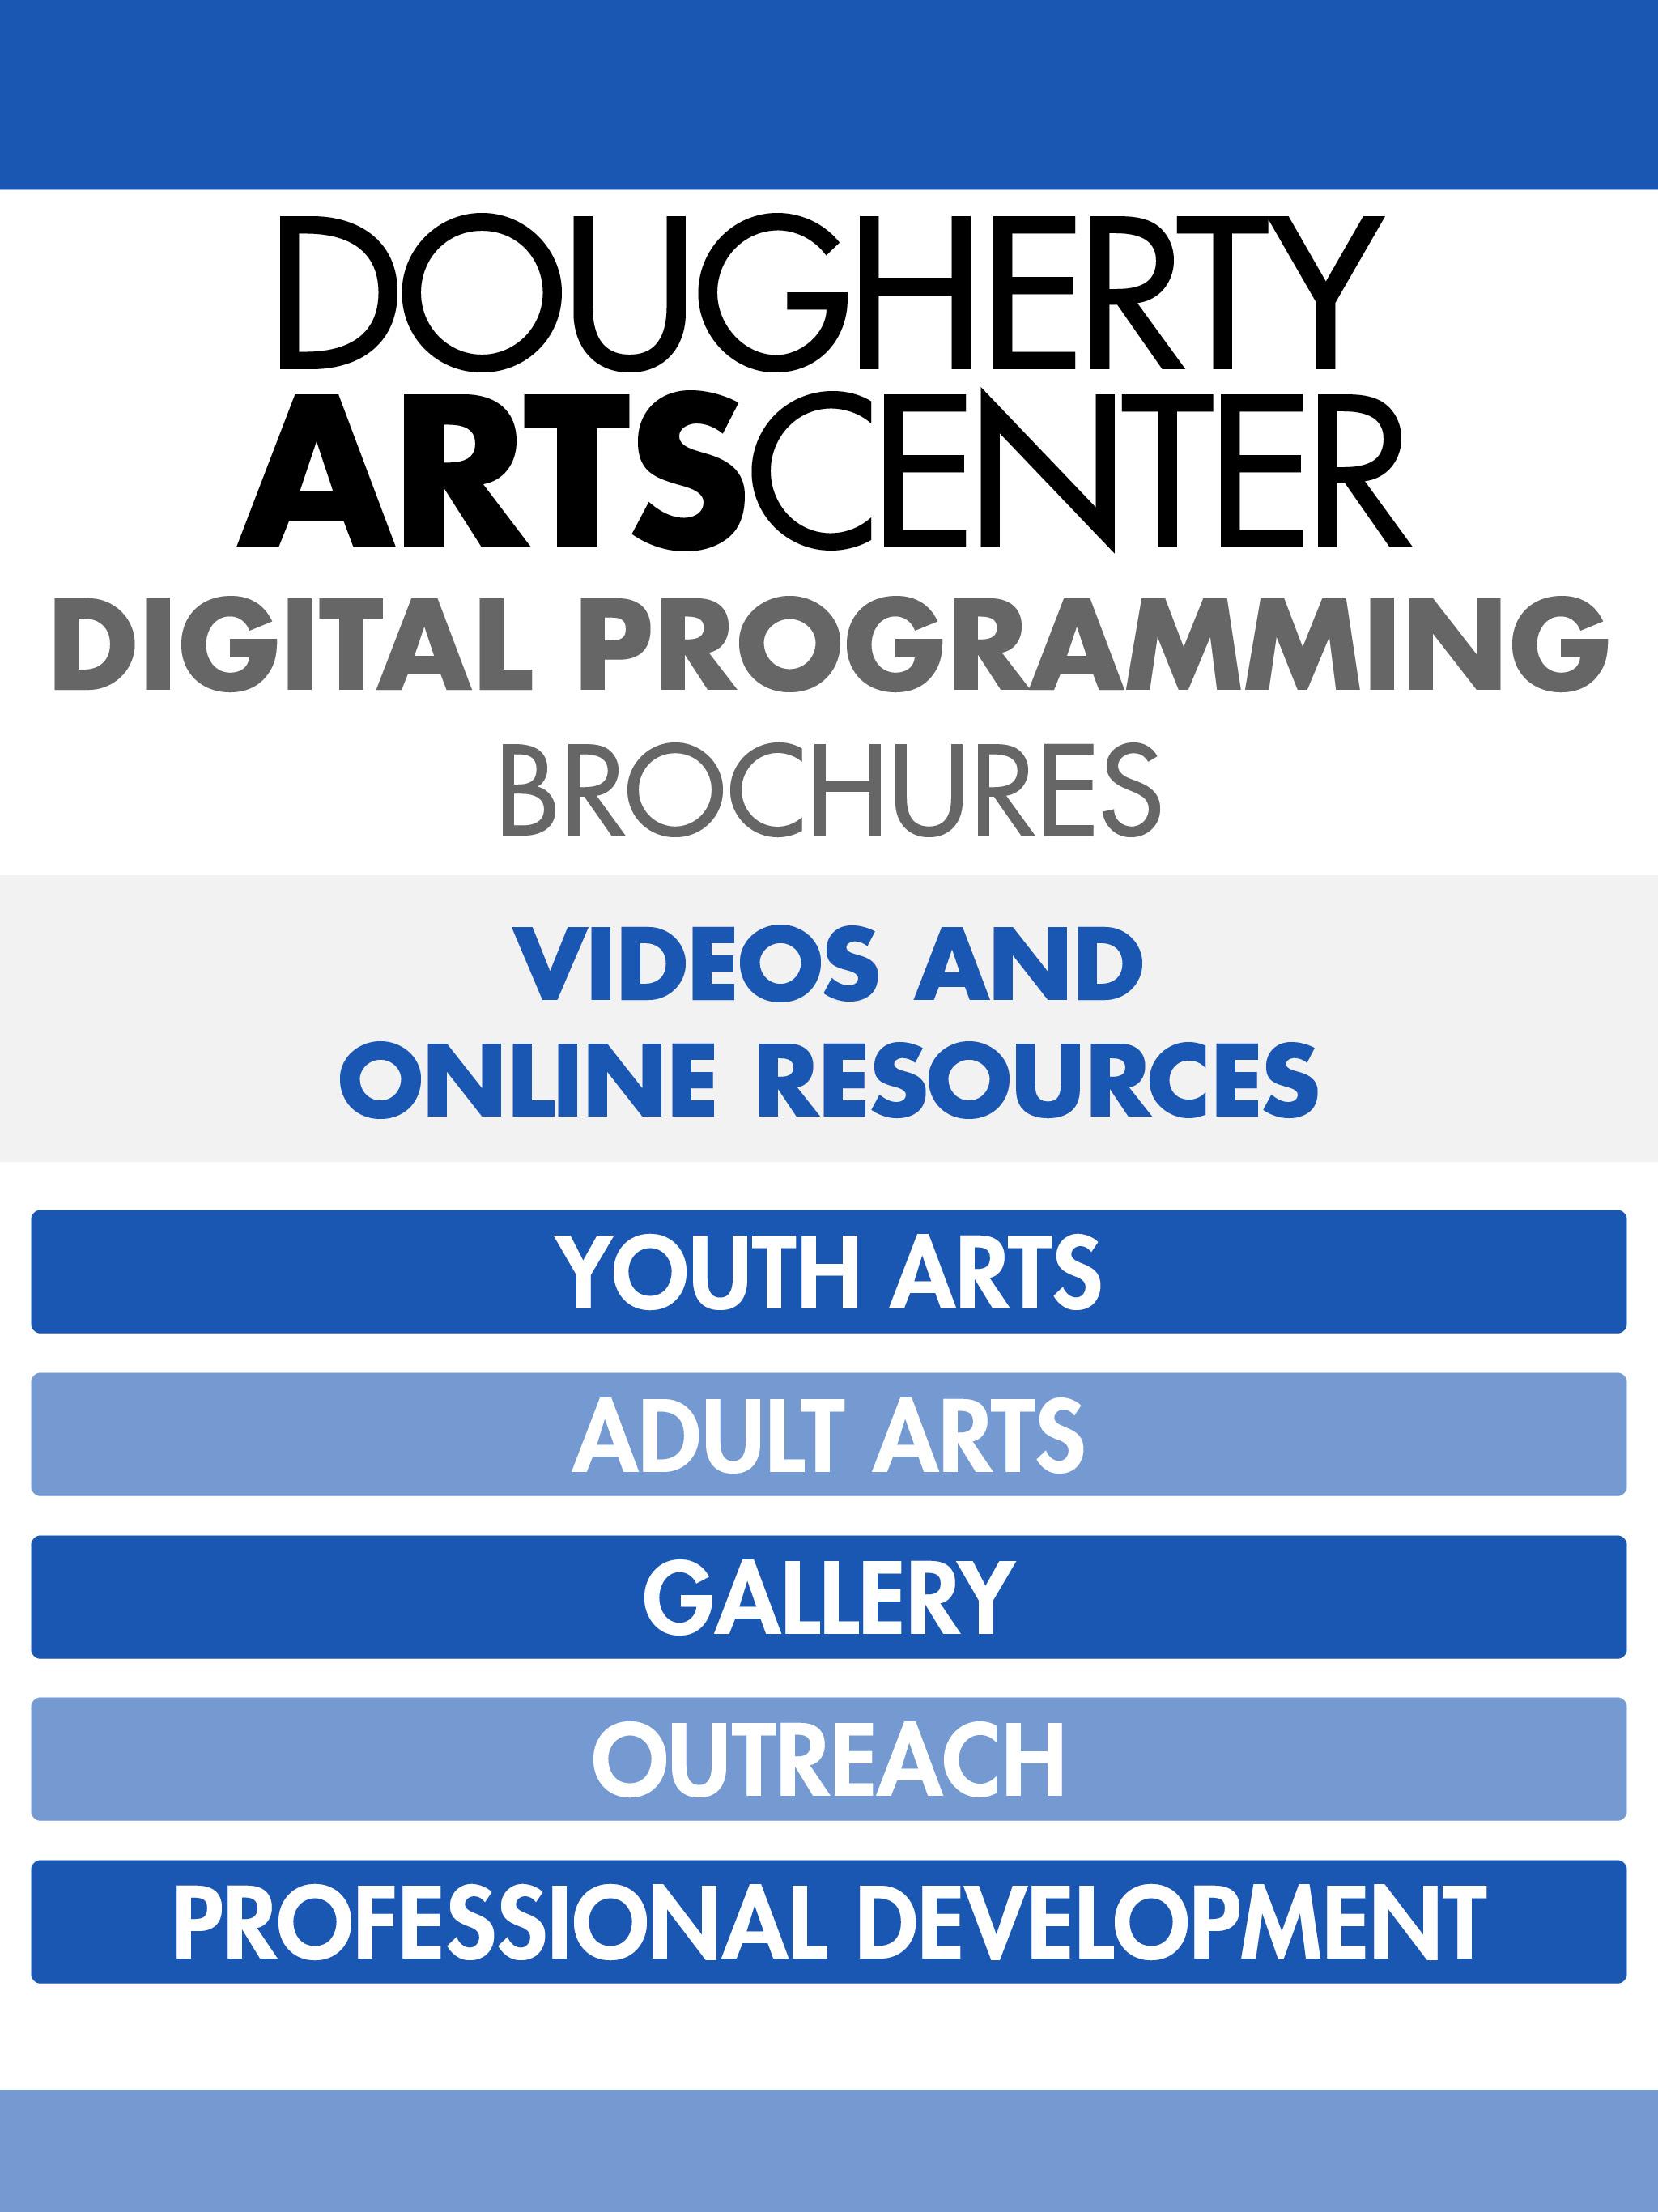 Digital Programming Brochures